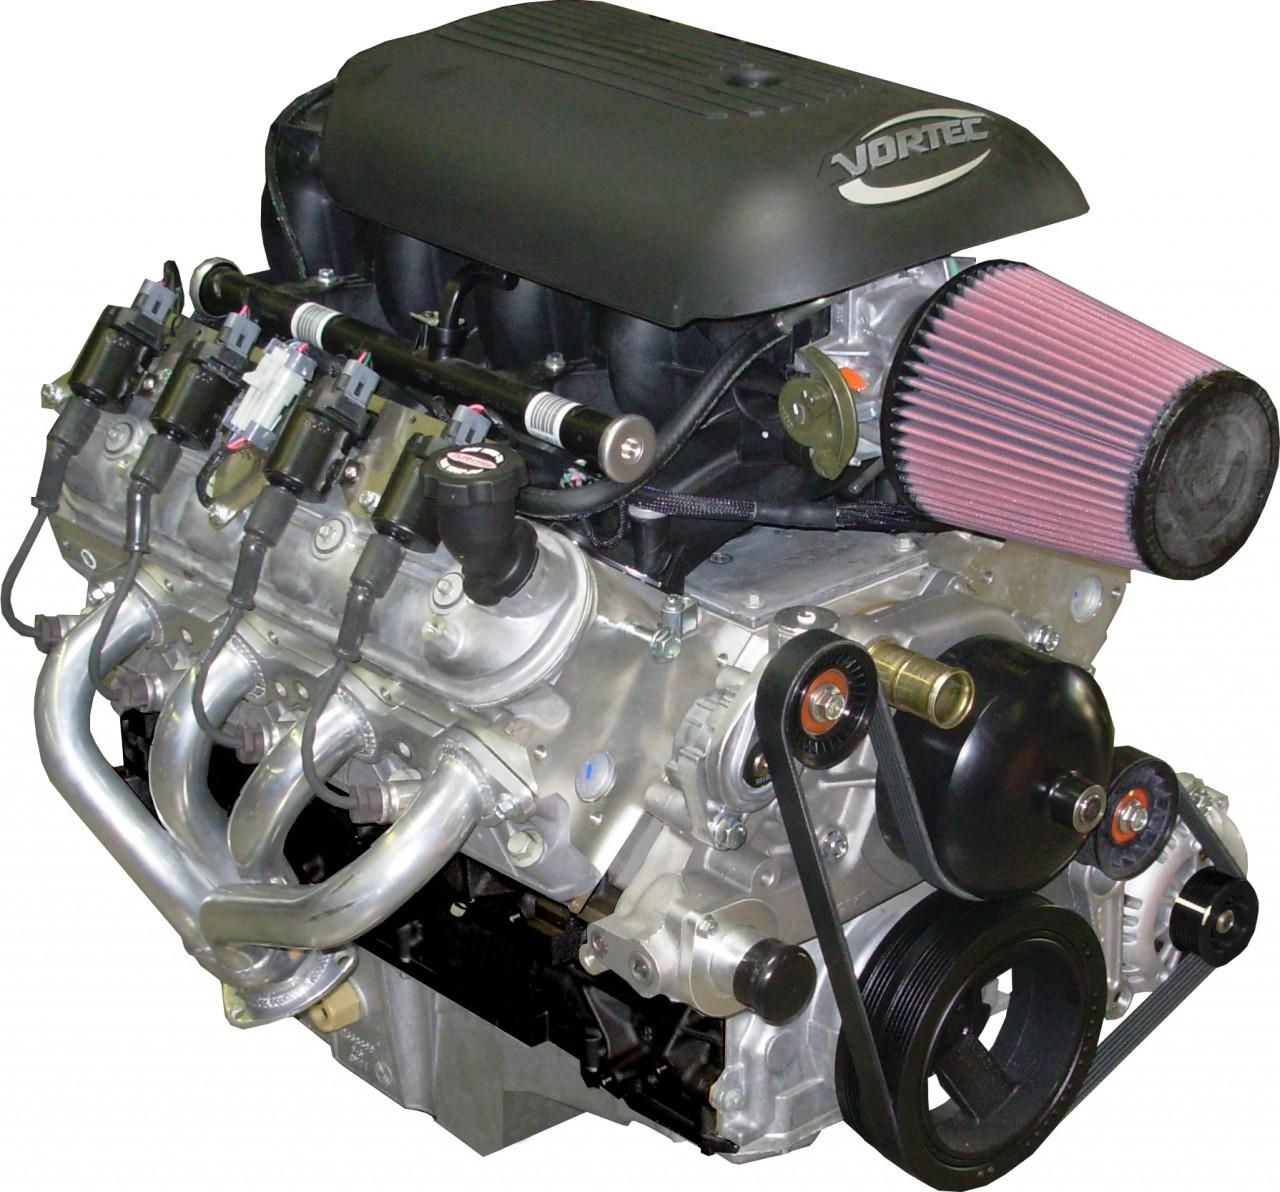 lq9_street__35712.1338916660.1280.1280  L Ford Engine Wiring Harness on ignition module, trailer hitch, edge trailer, e4od transmission, tow package, engine swap, transmission external, 250 fog light, efi conversion, fuel injection, trailer brake controller,